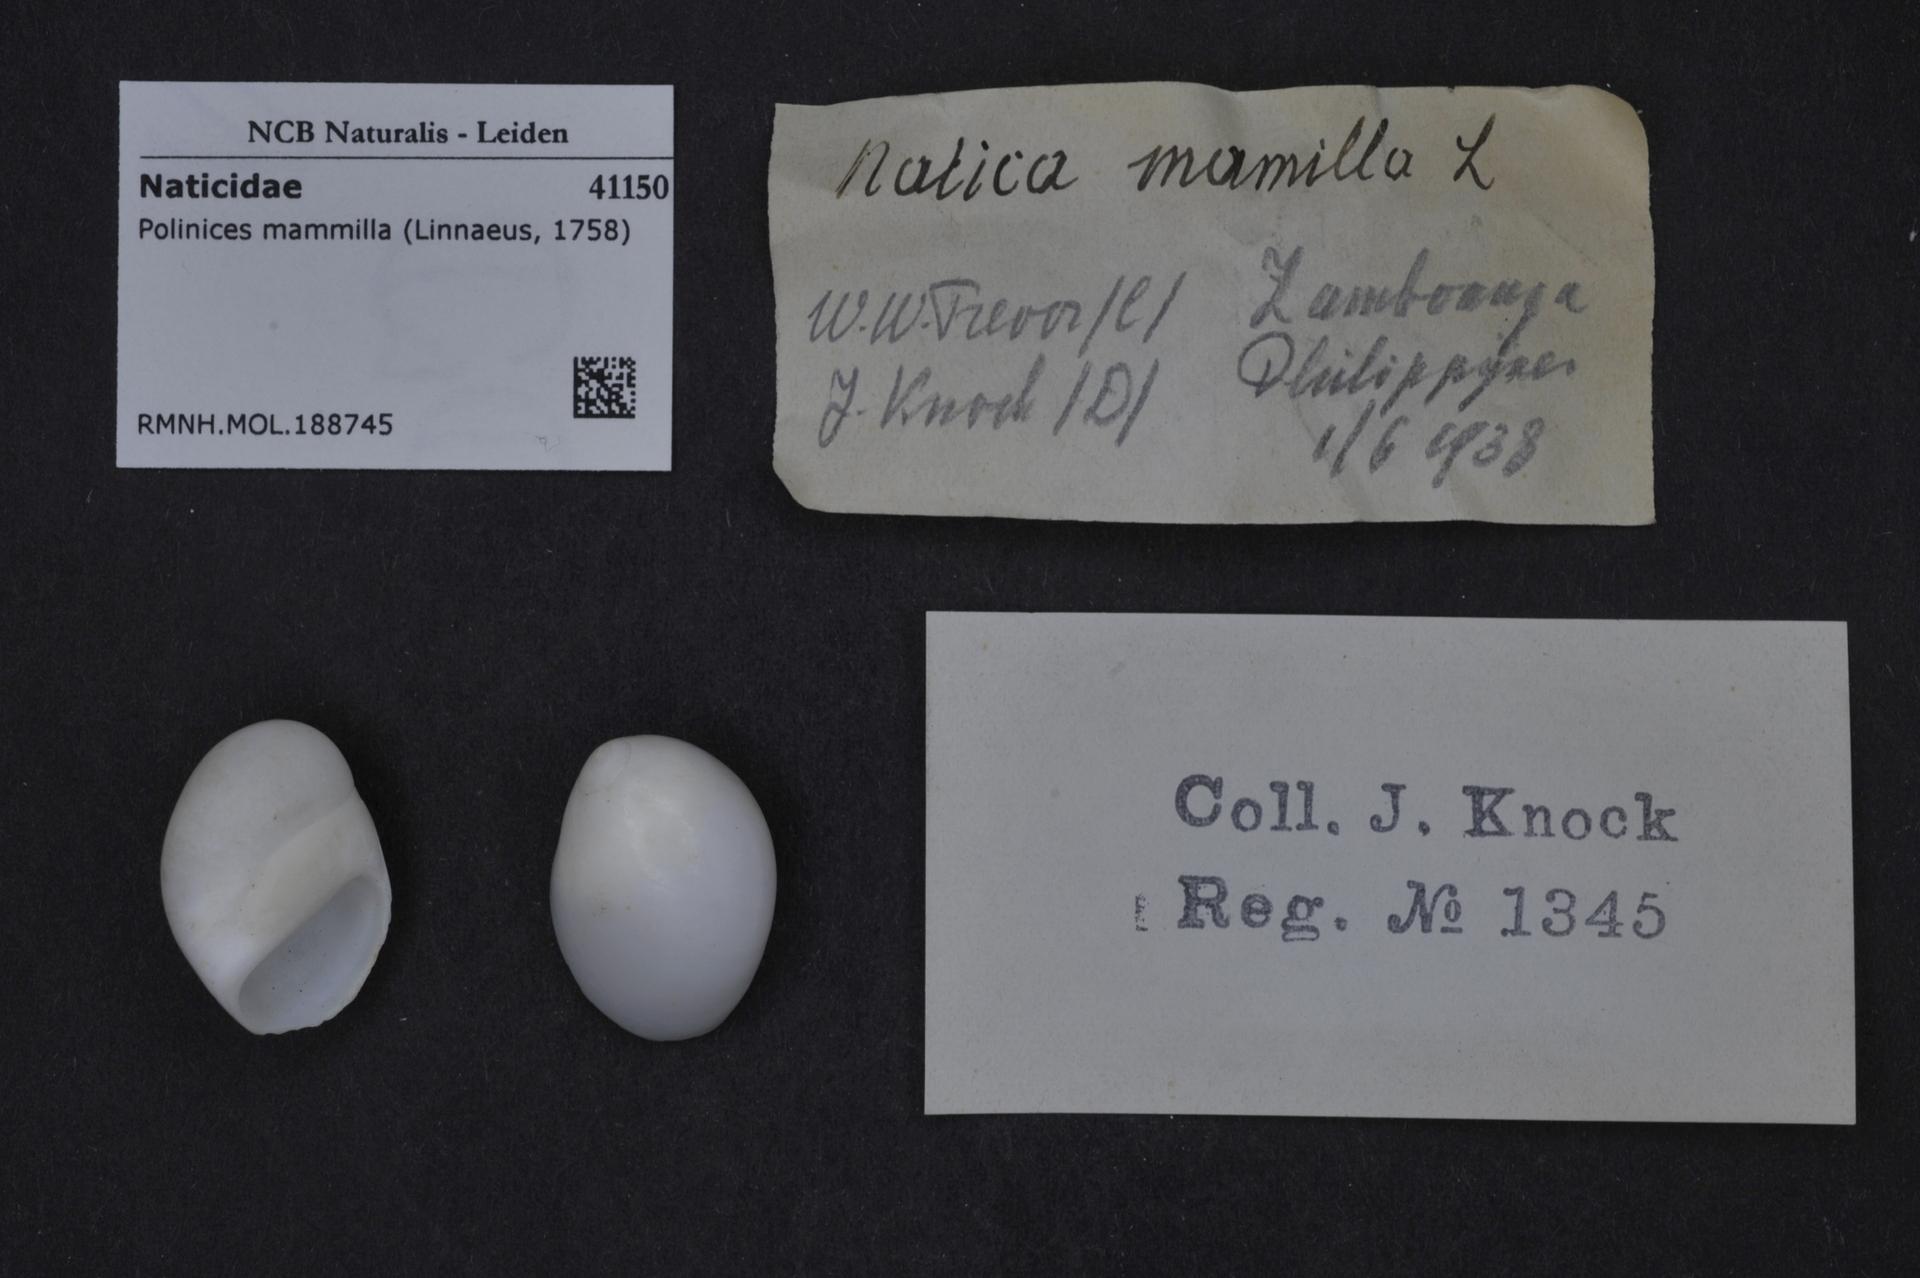 RMNH.MOL.188745 | Polinices mammilla (Linnaeus, 1758)